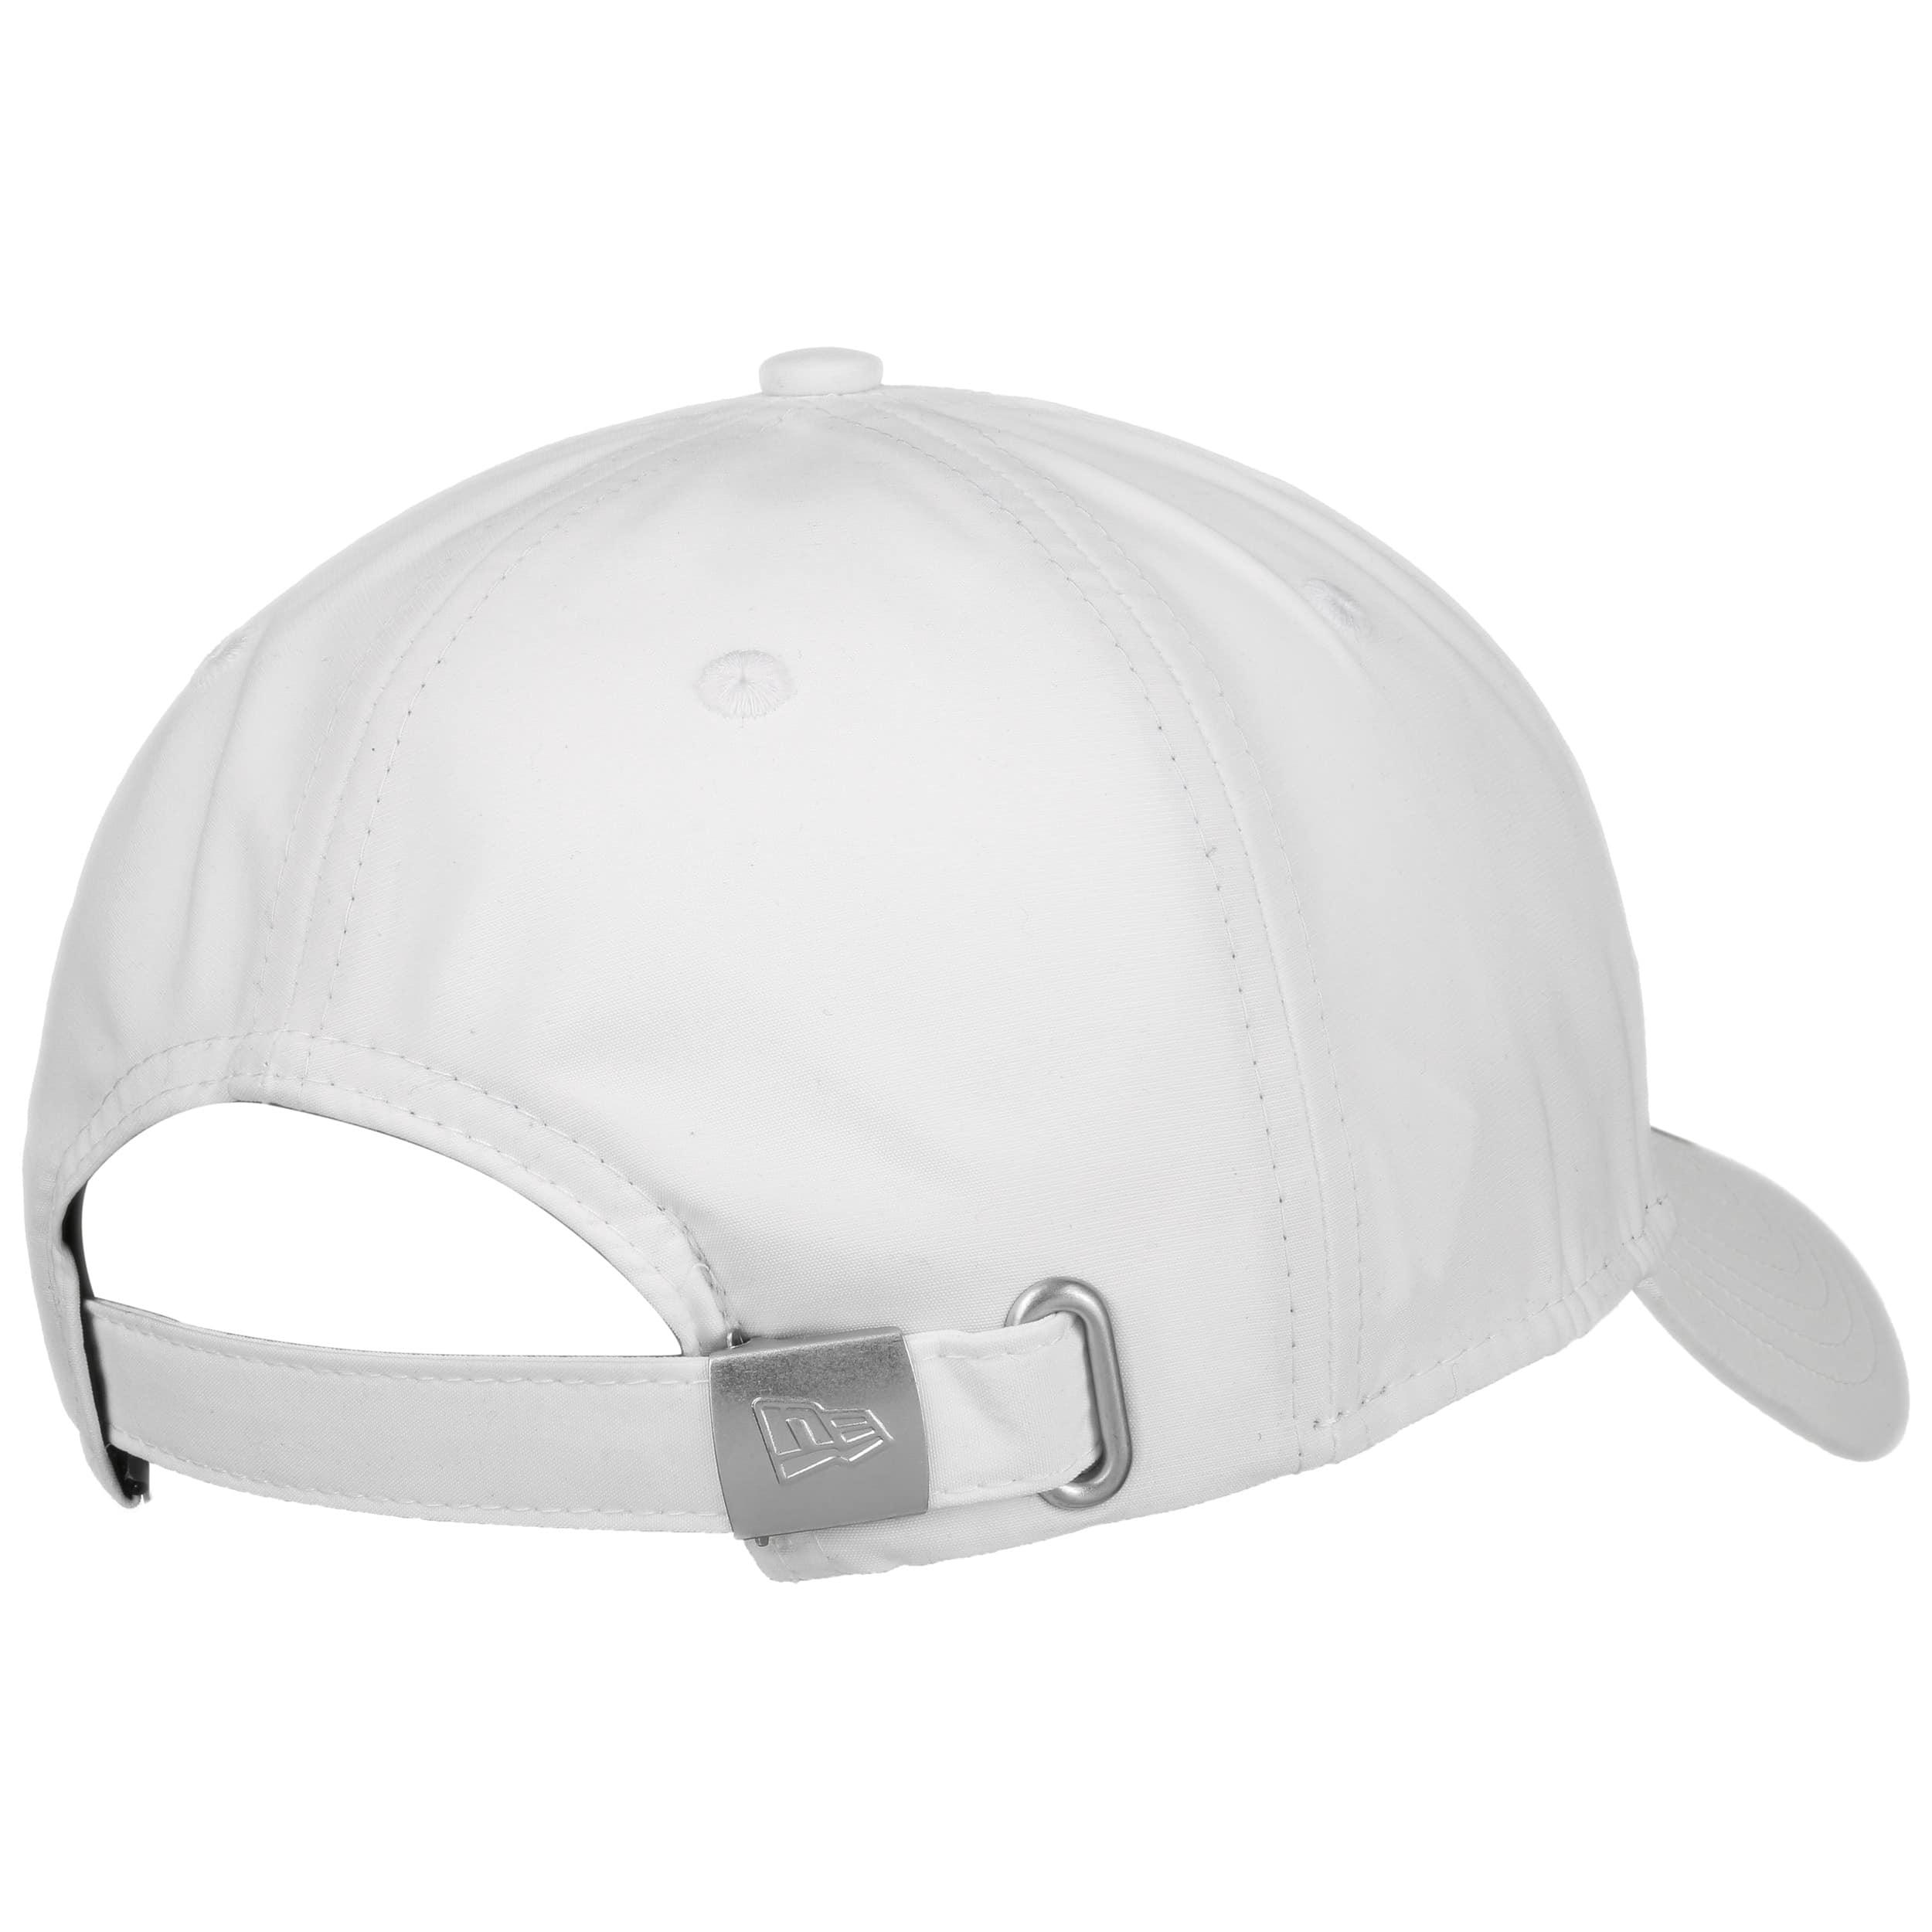 ... 9Forty NY Yankees Strapback Cap by New Era - white 3 ... 58524edbef32